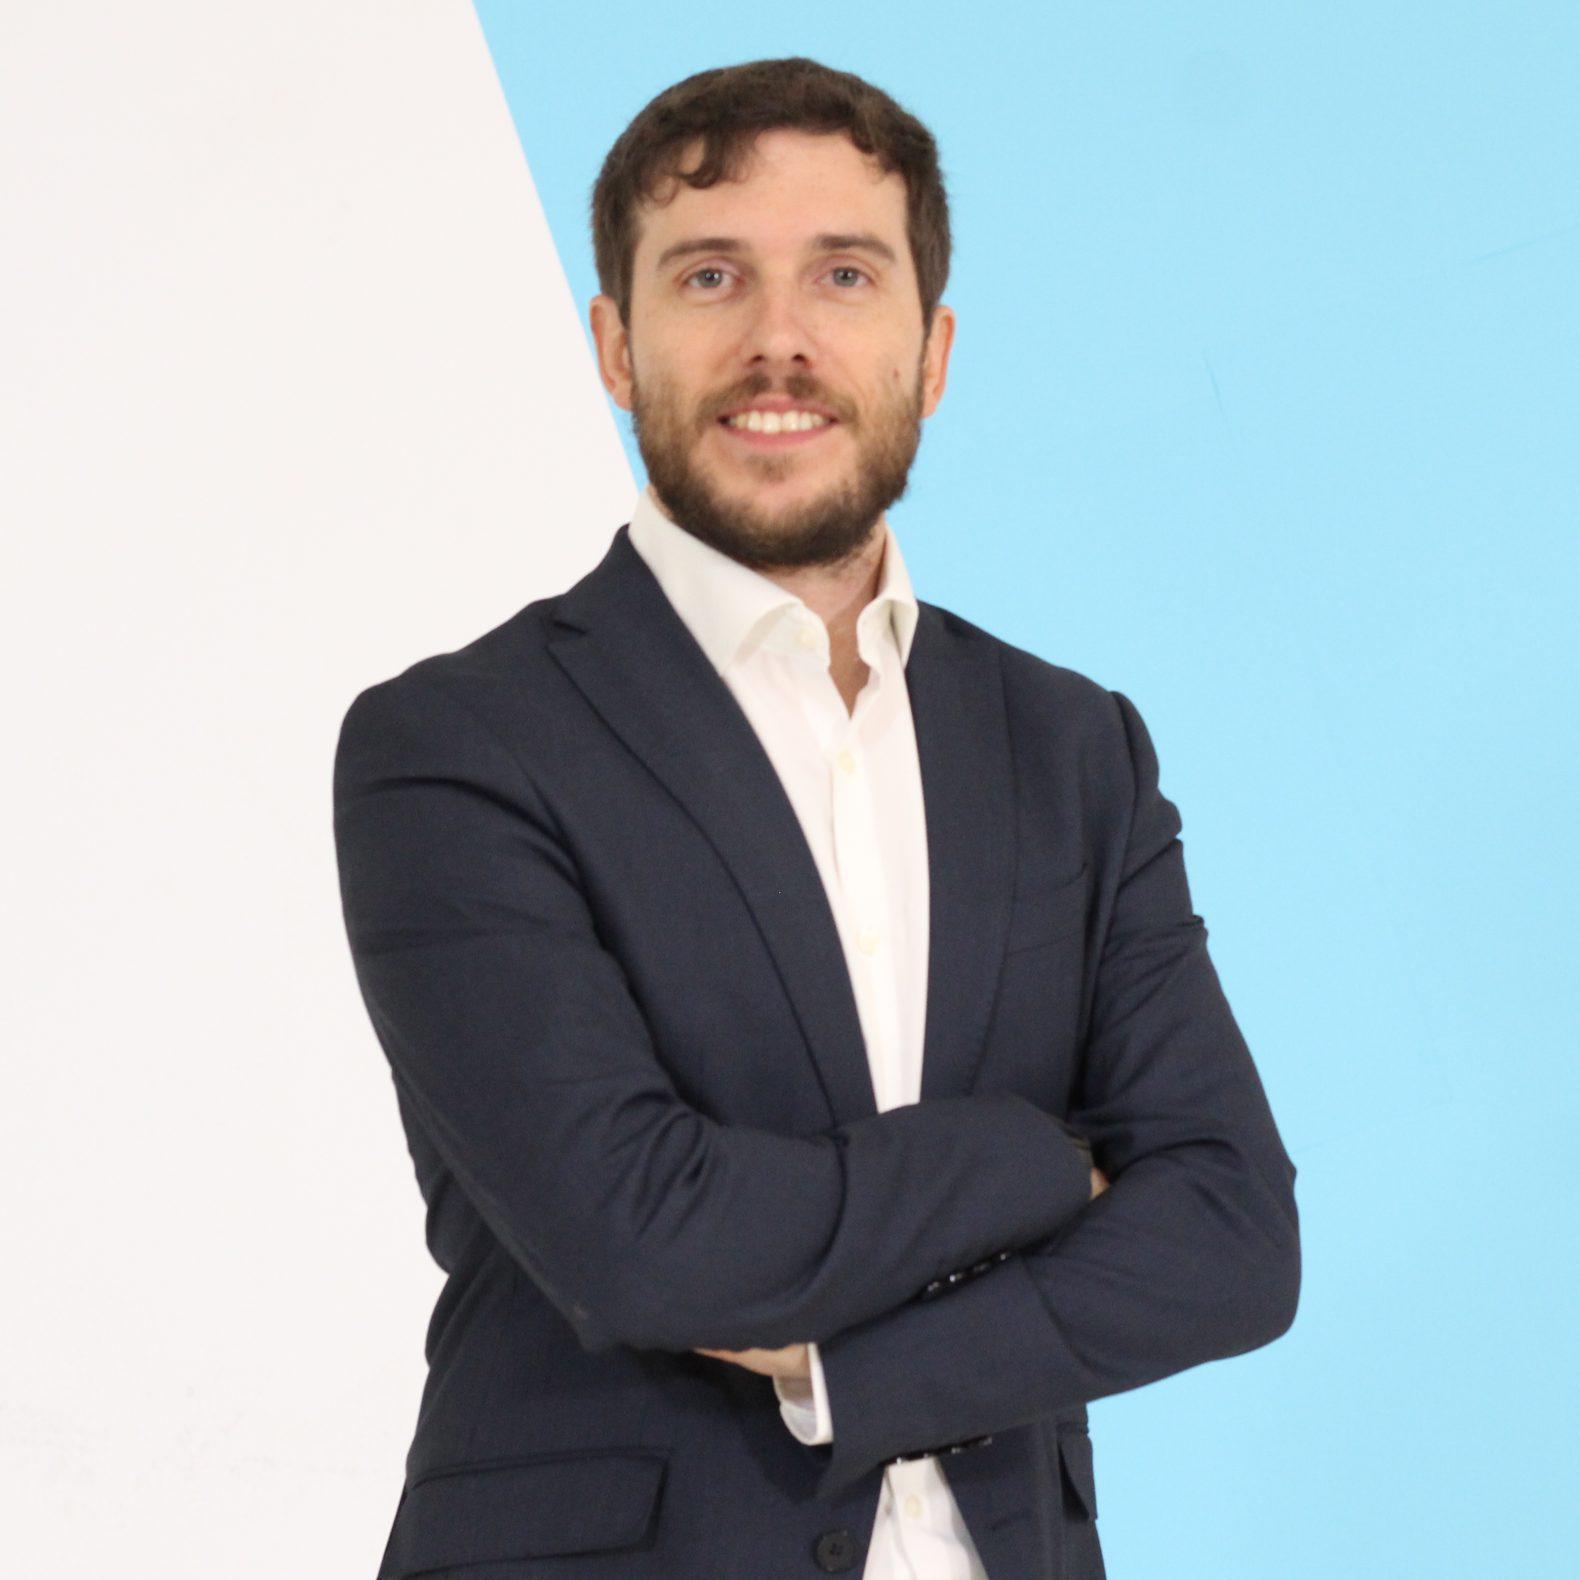 Antonio Morey